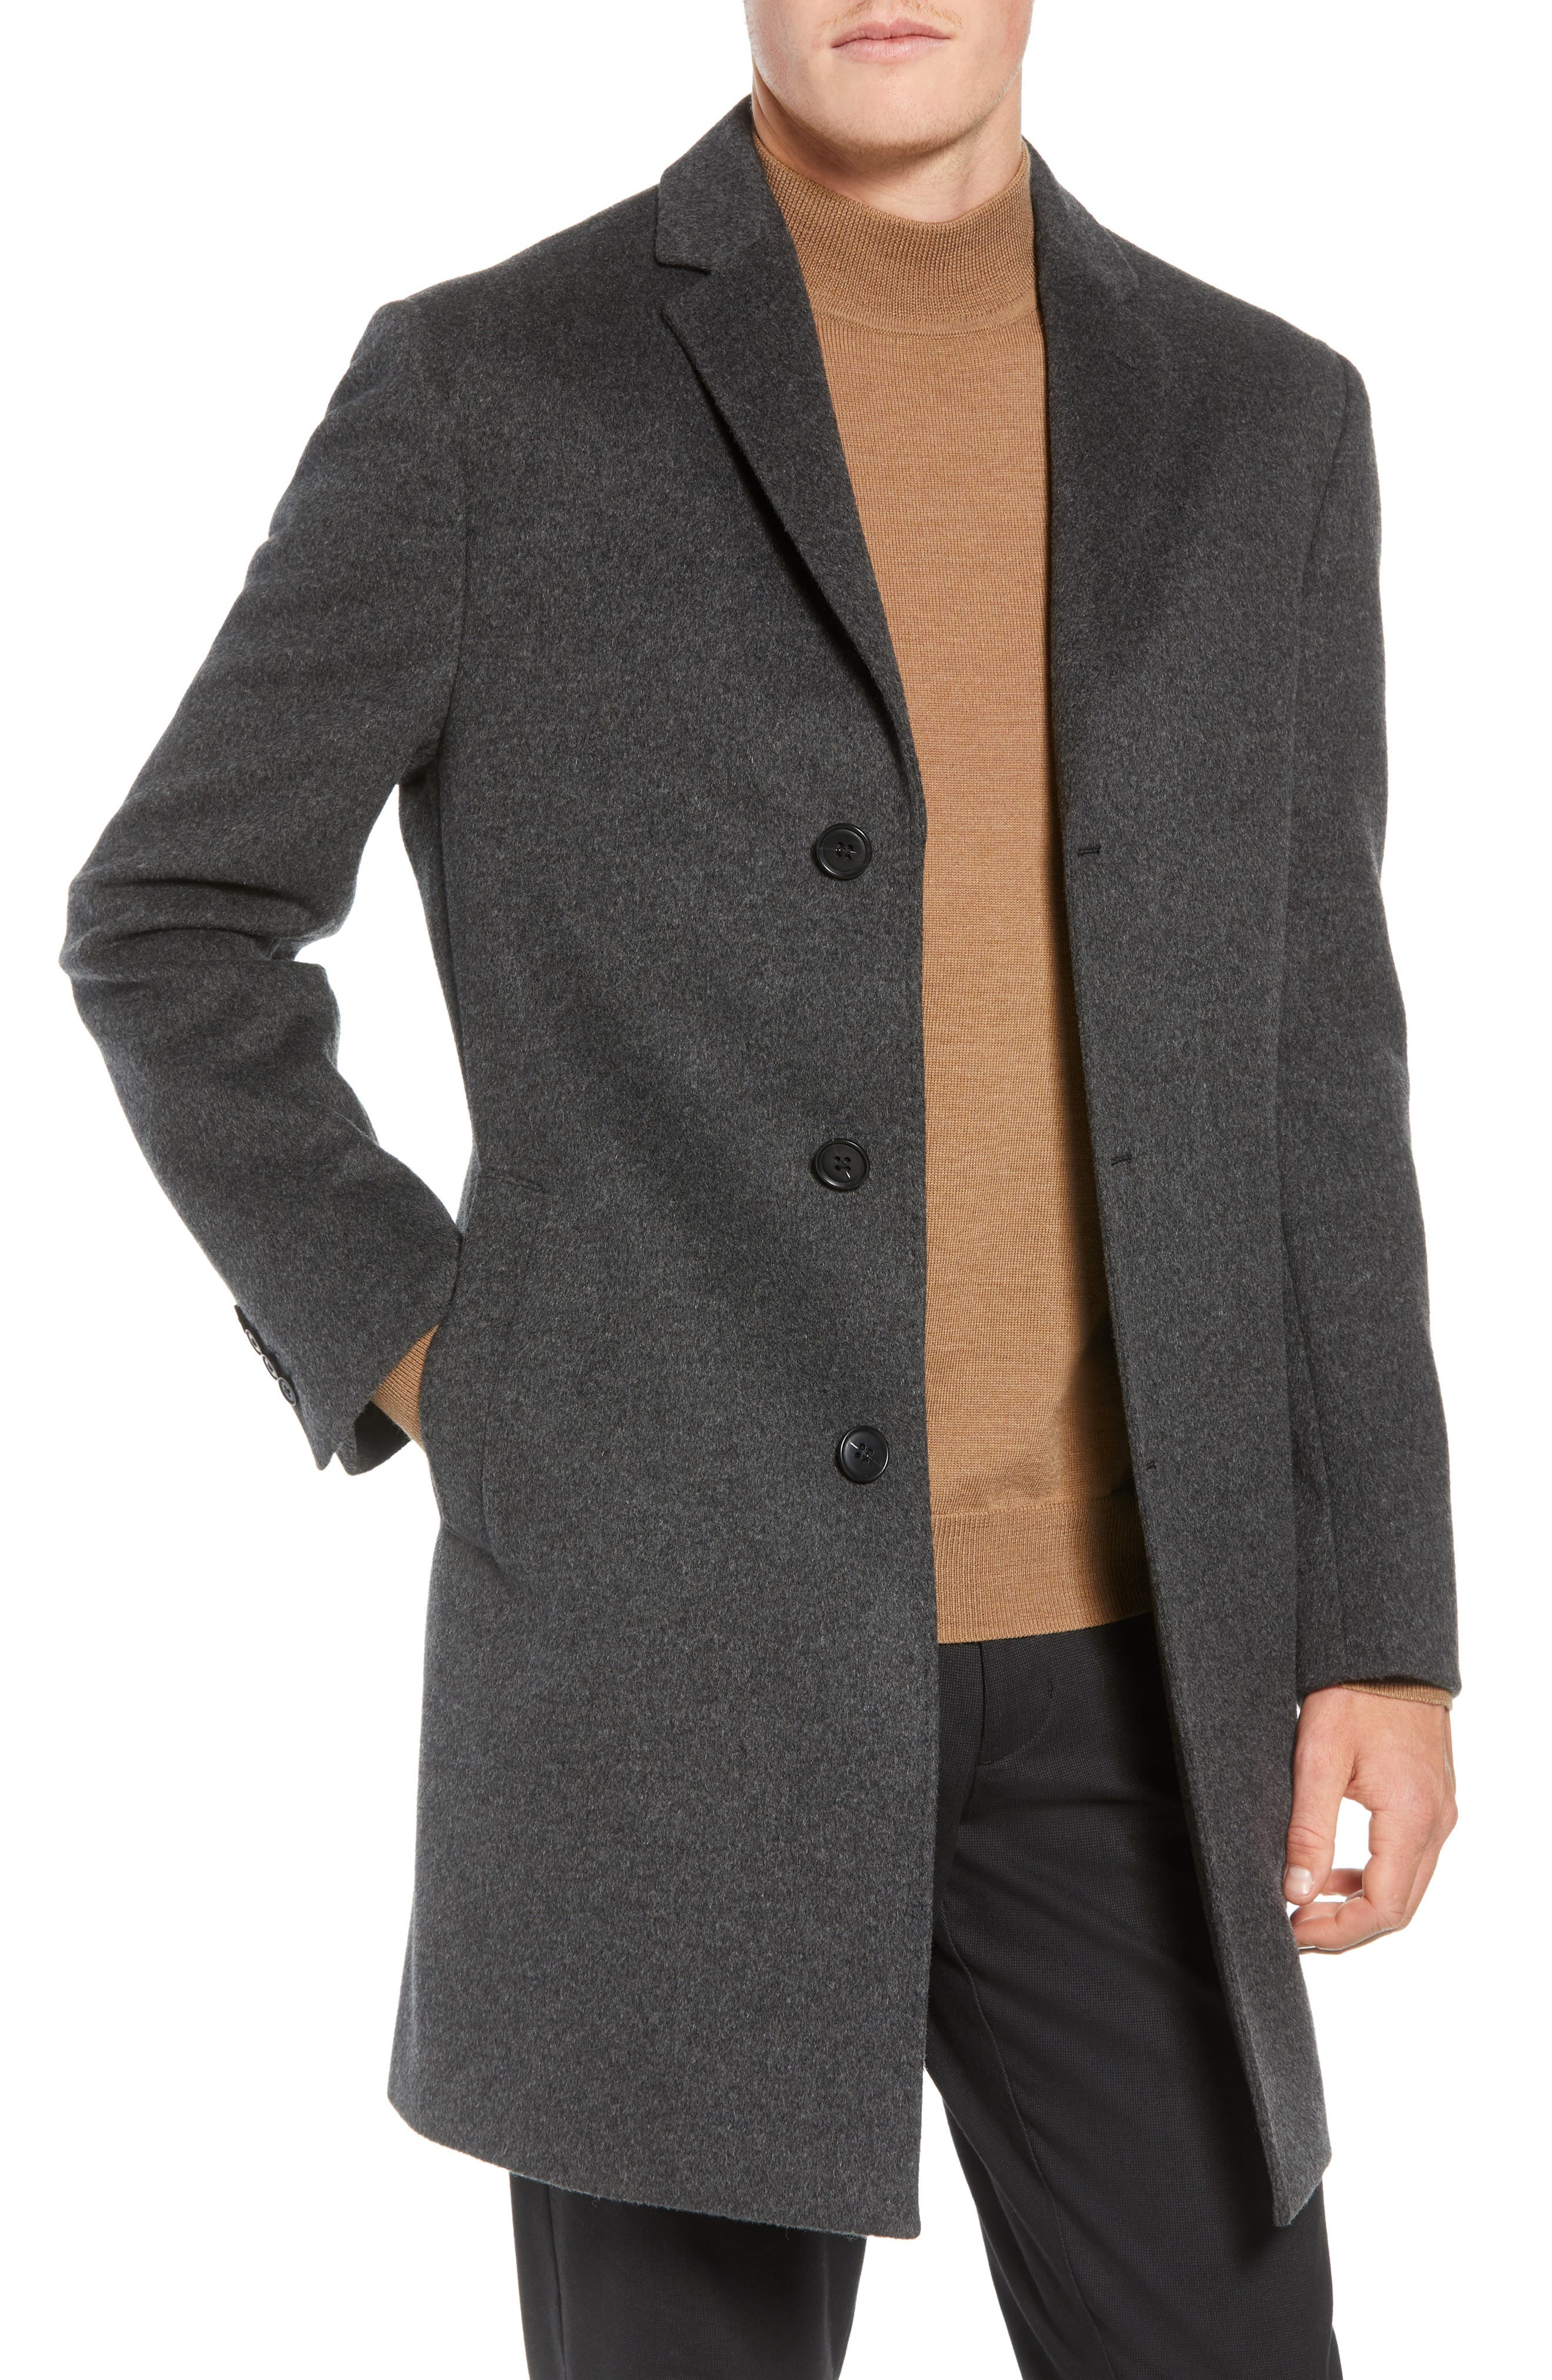 Mason Wool & Cashmere Overcoat,                             Main thumbnail 1, color,                             CHARCOAL